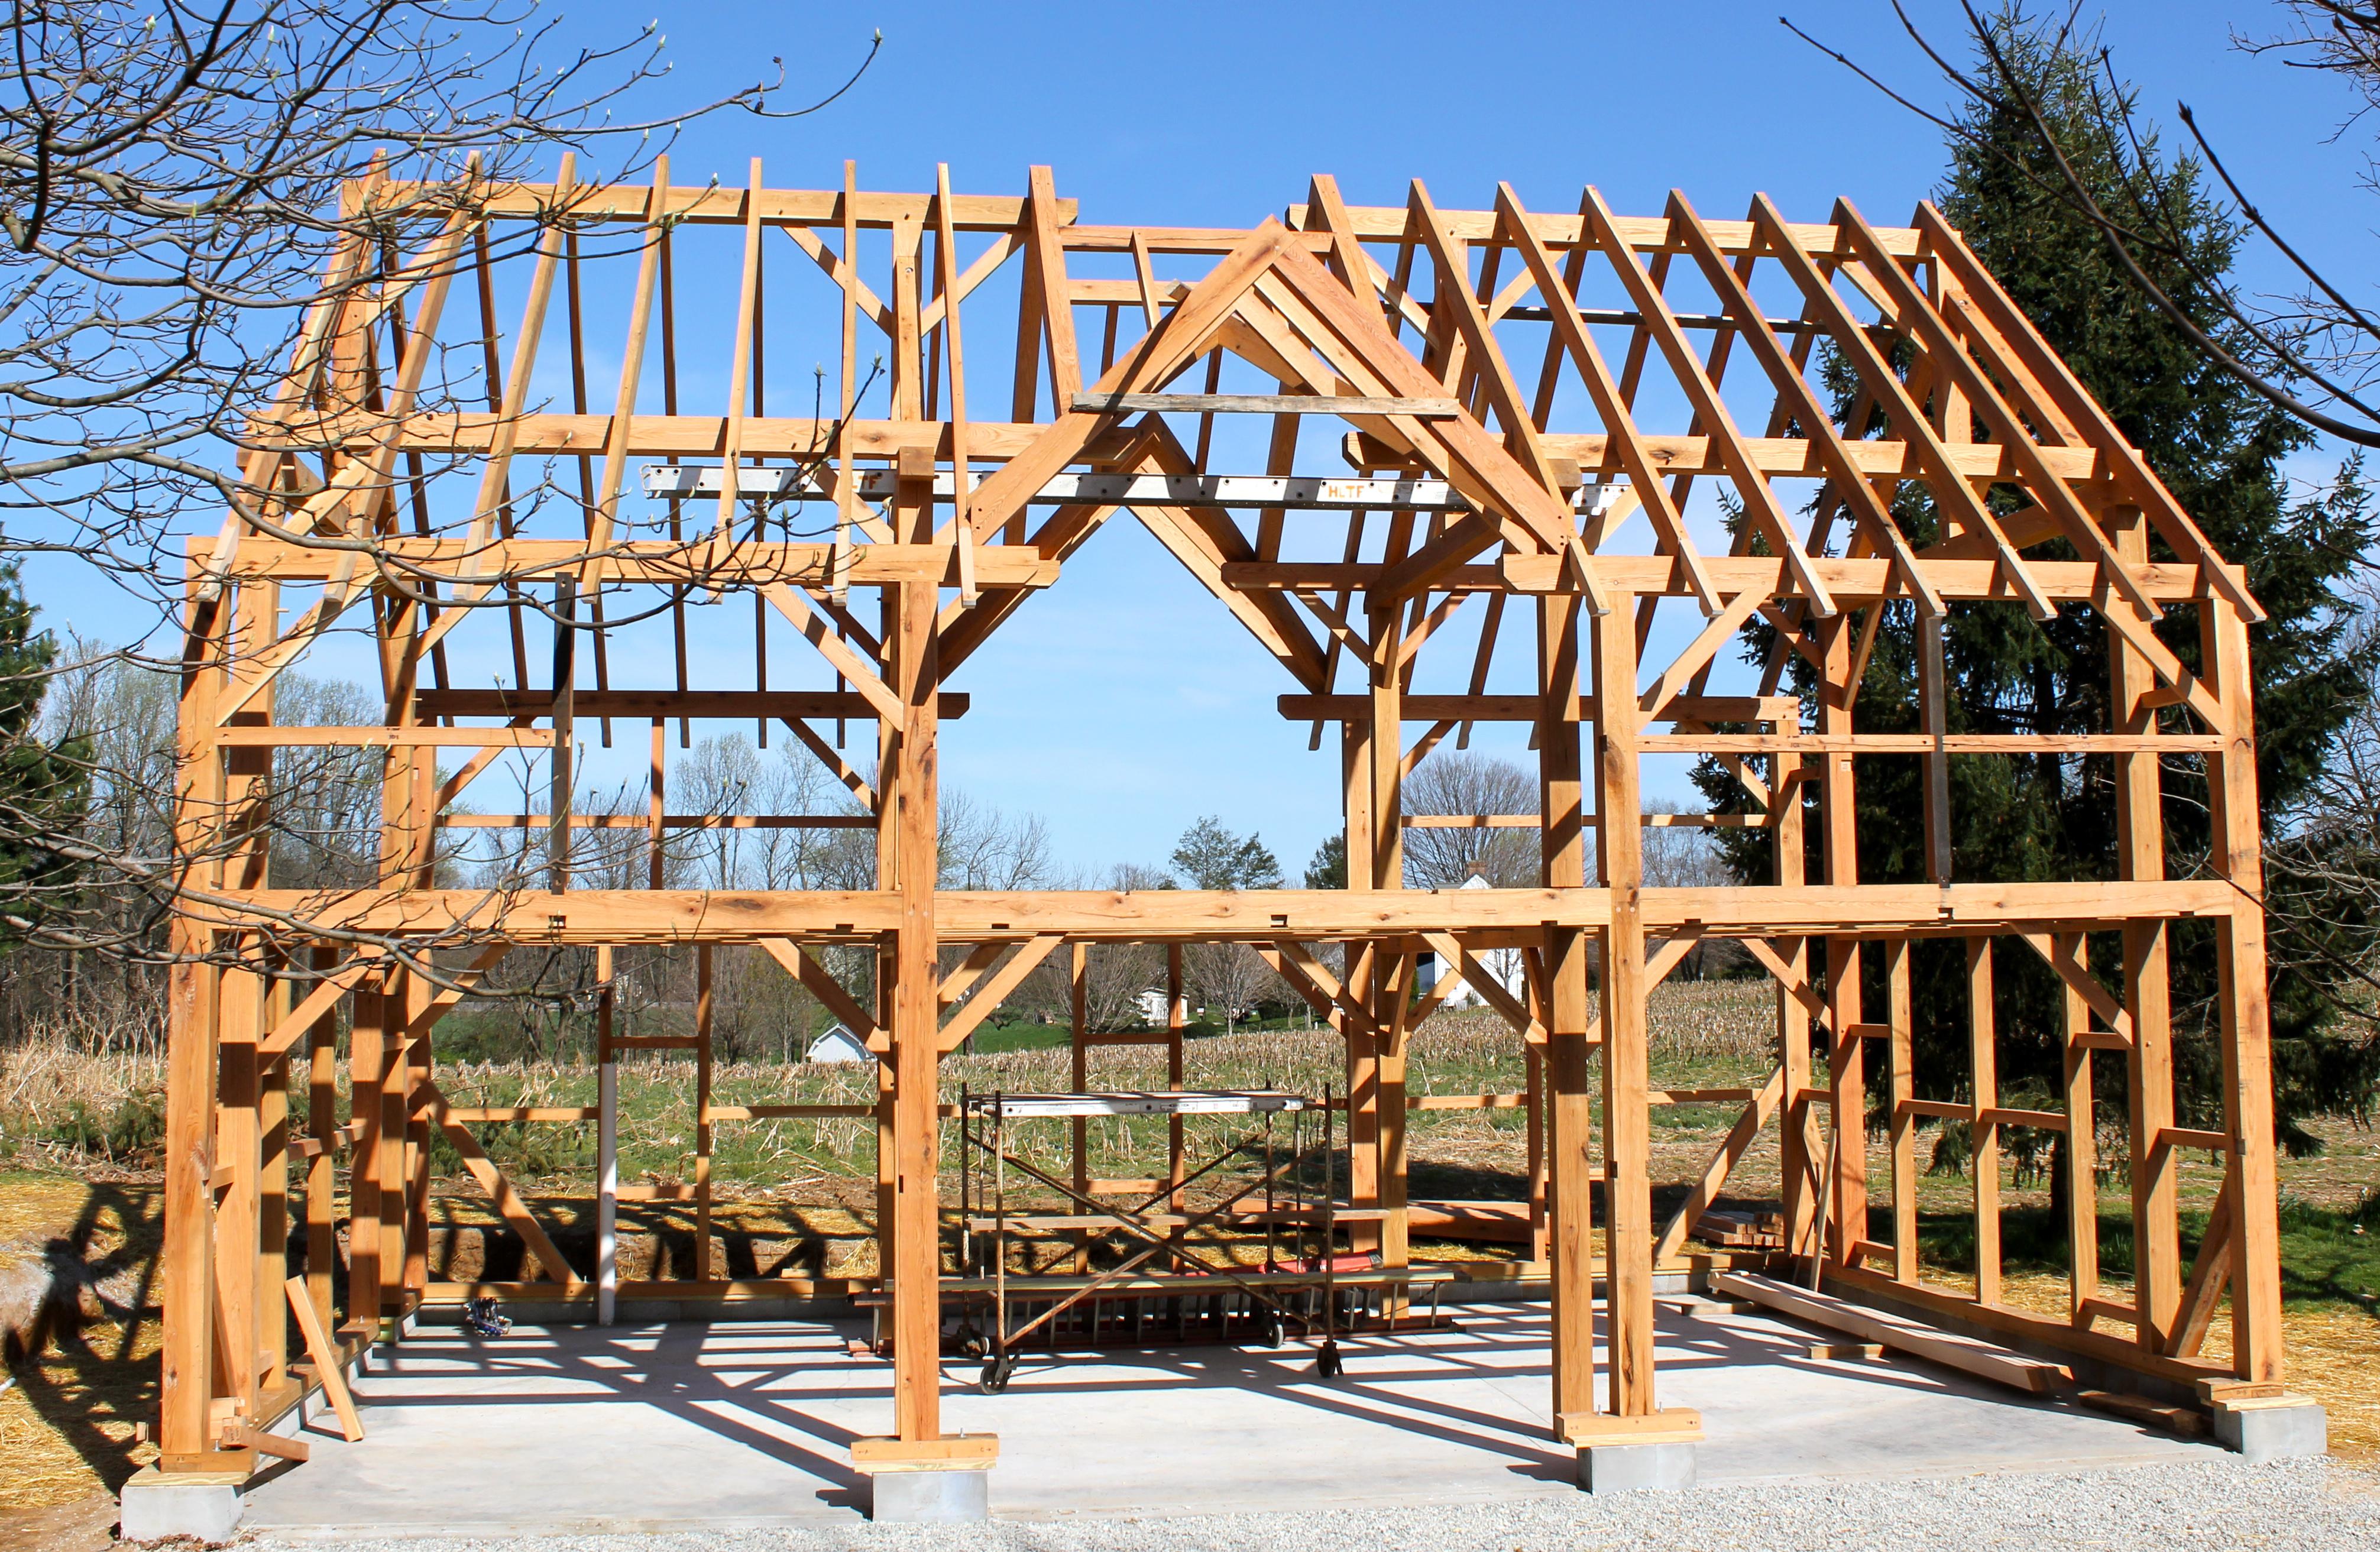 Timber Framed Carriage Shed Raising - Hugh Lofting Timber